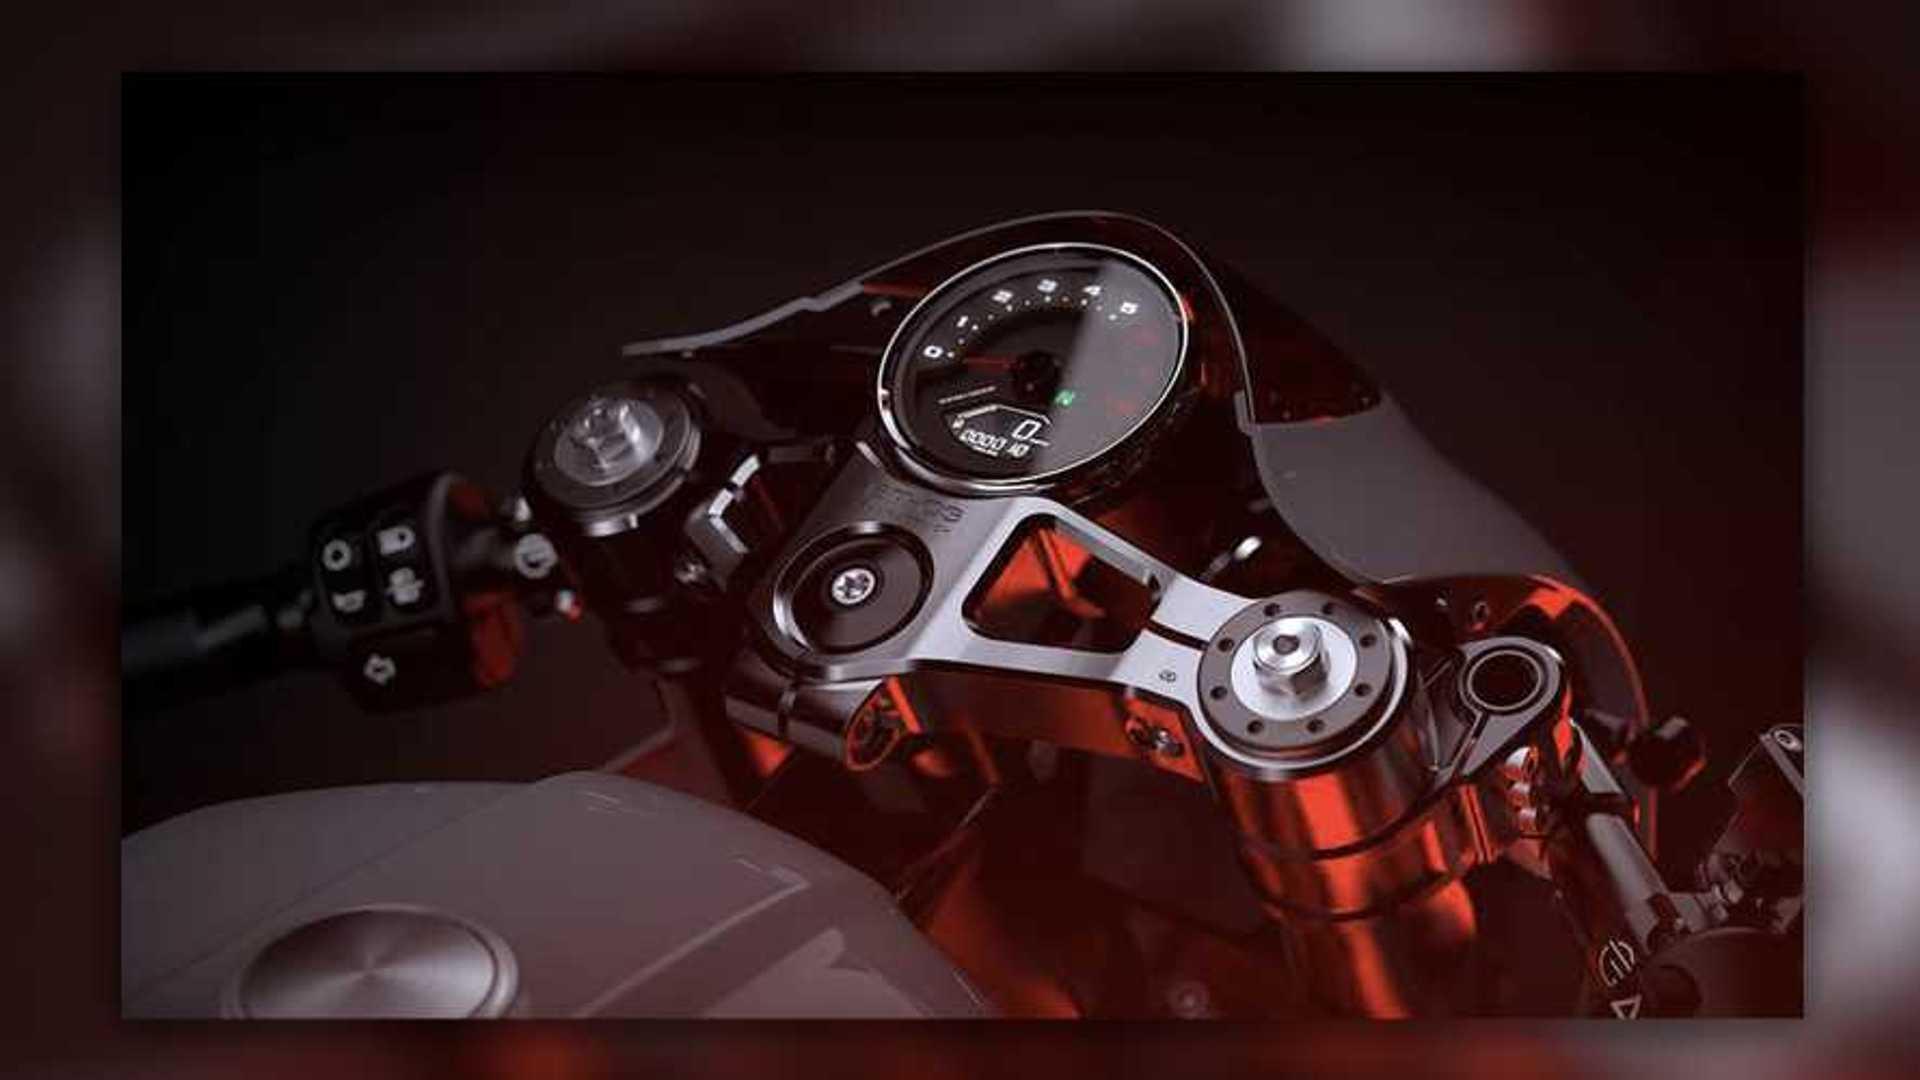 You Can Now Order A Harley-Davidson Café Racer